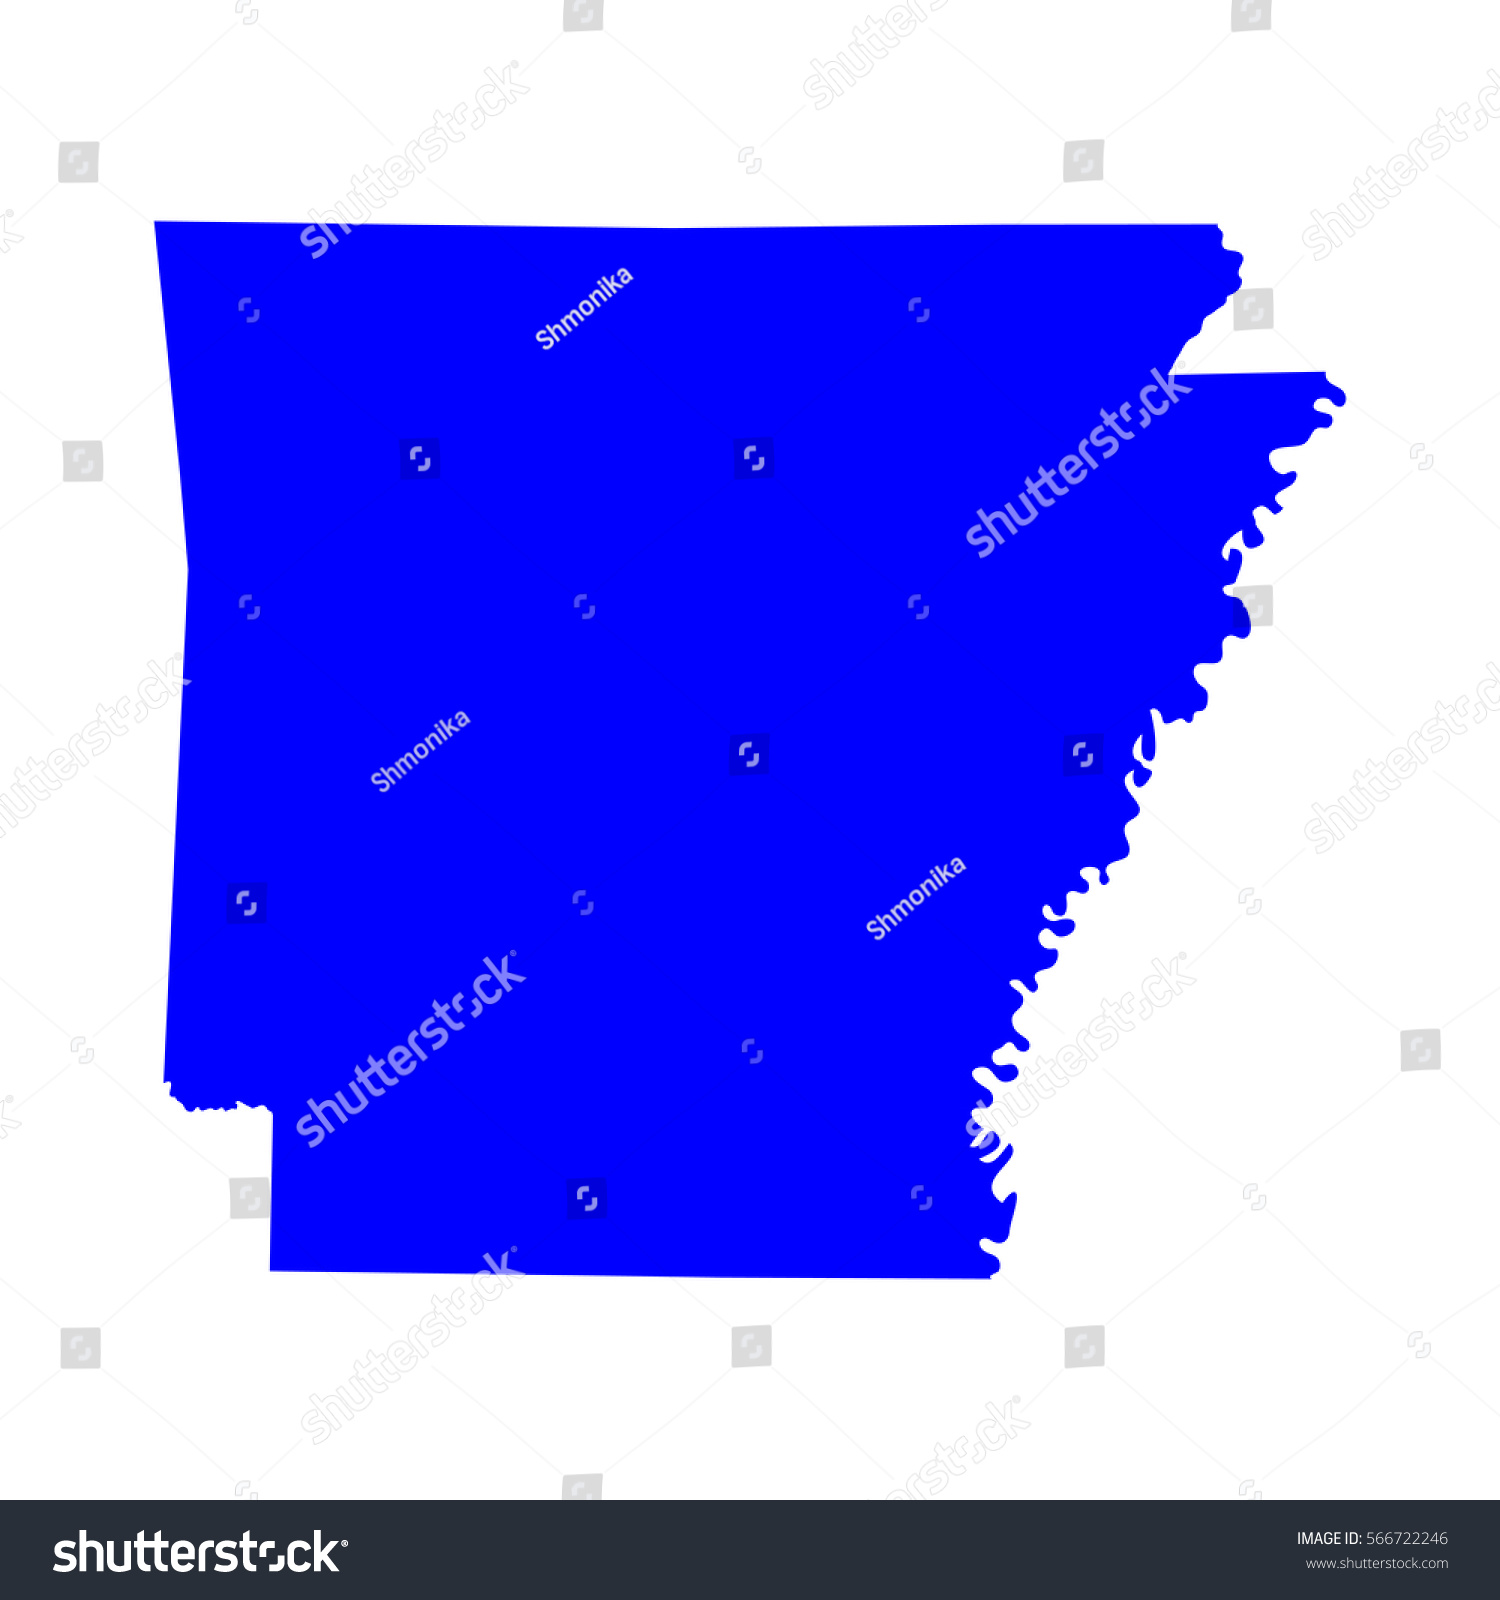 Map Us State Arkansas Vector Stock Vector  Shutterstock - Us map with arkansas